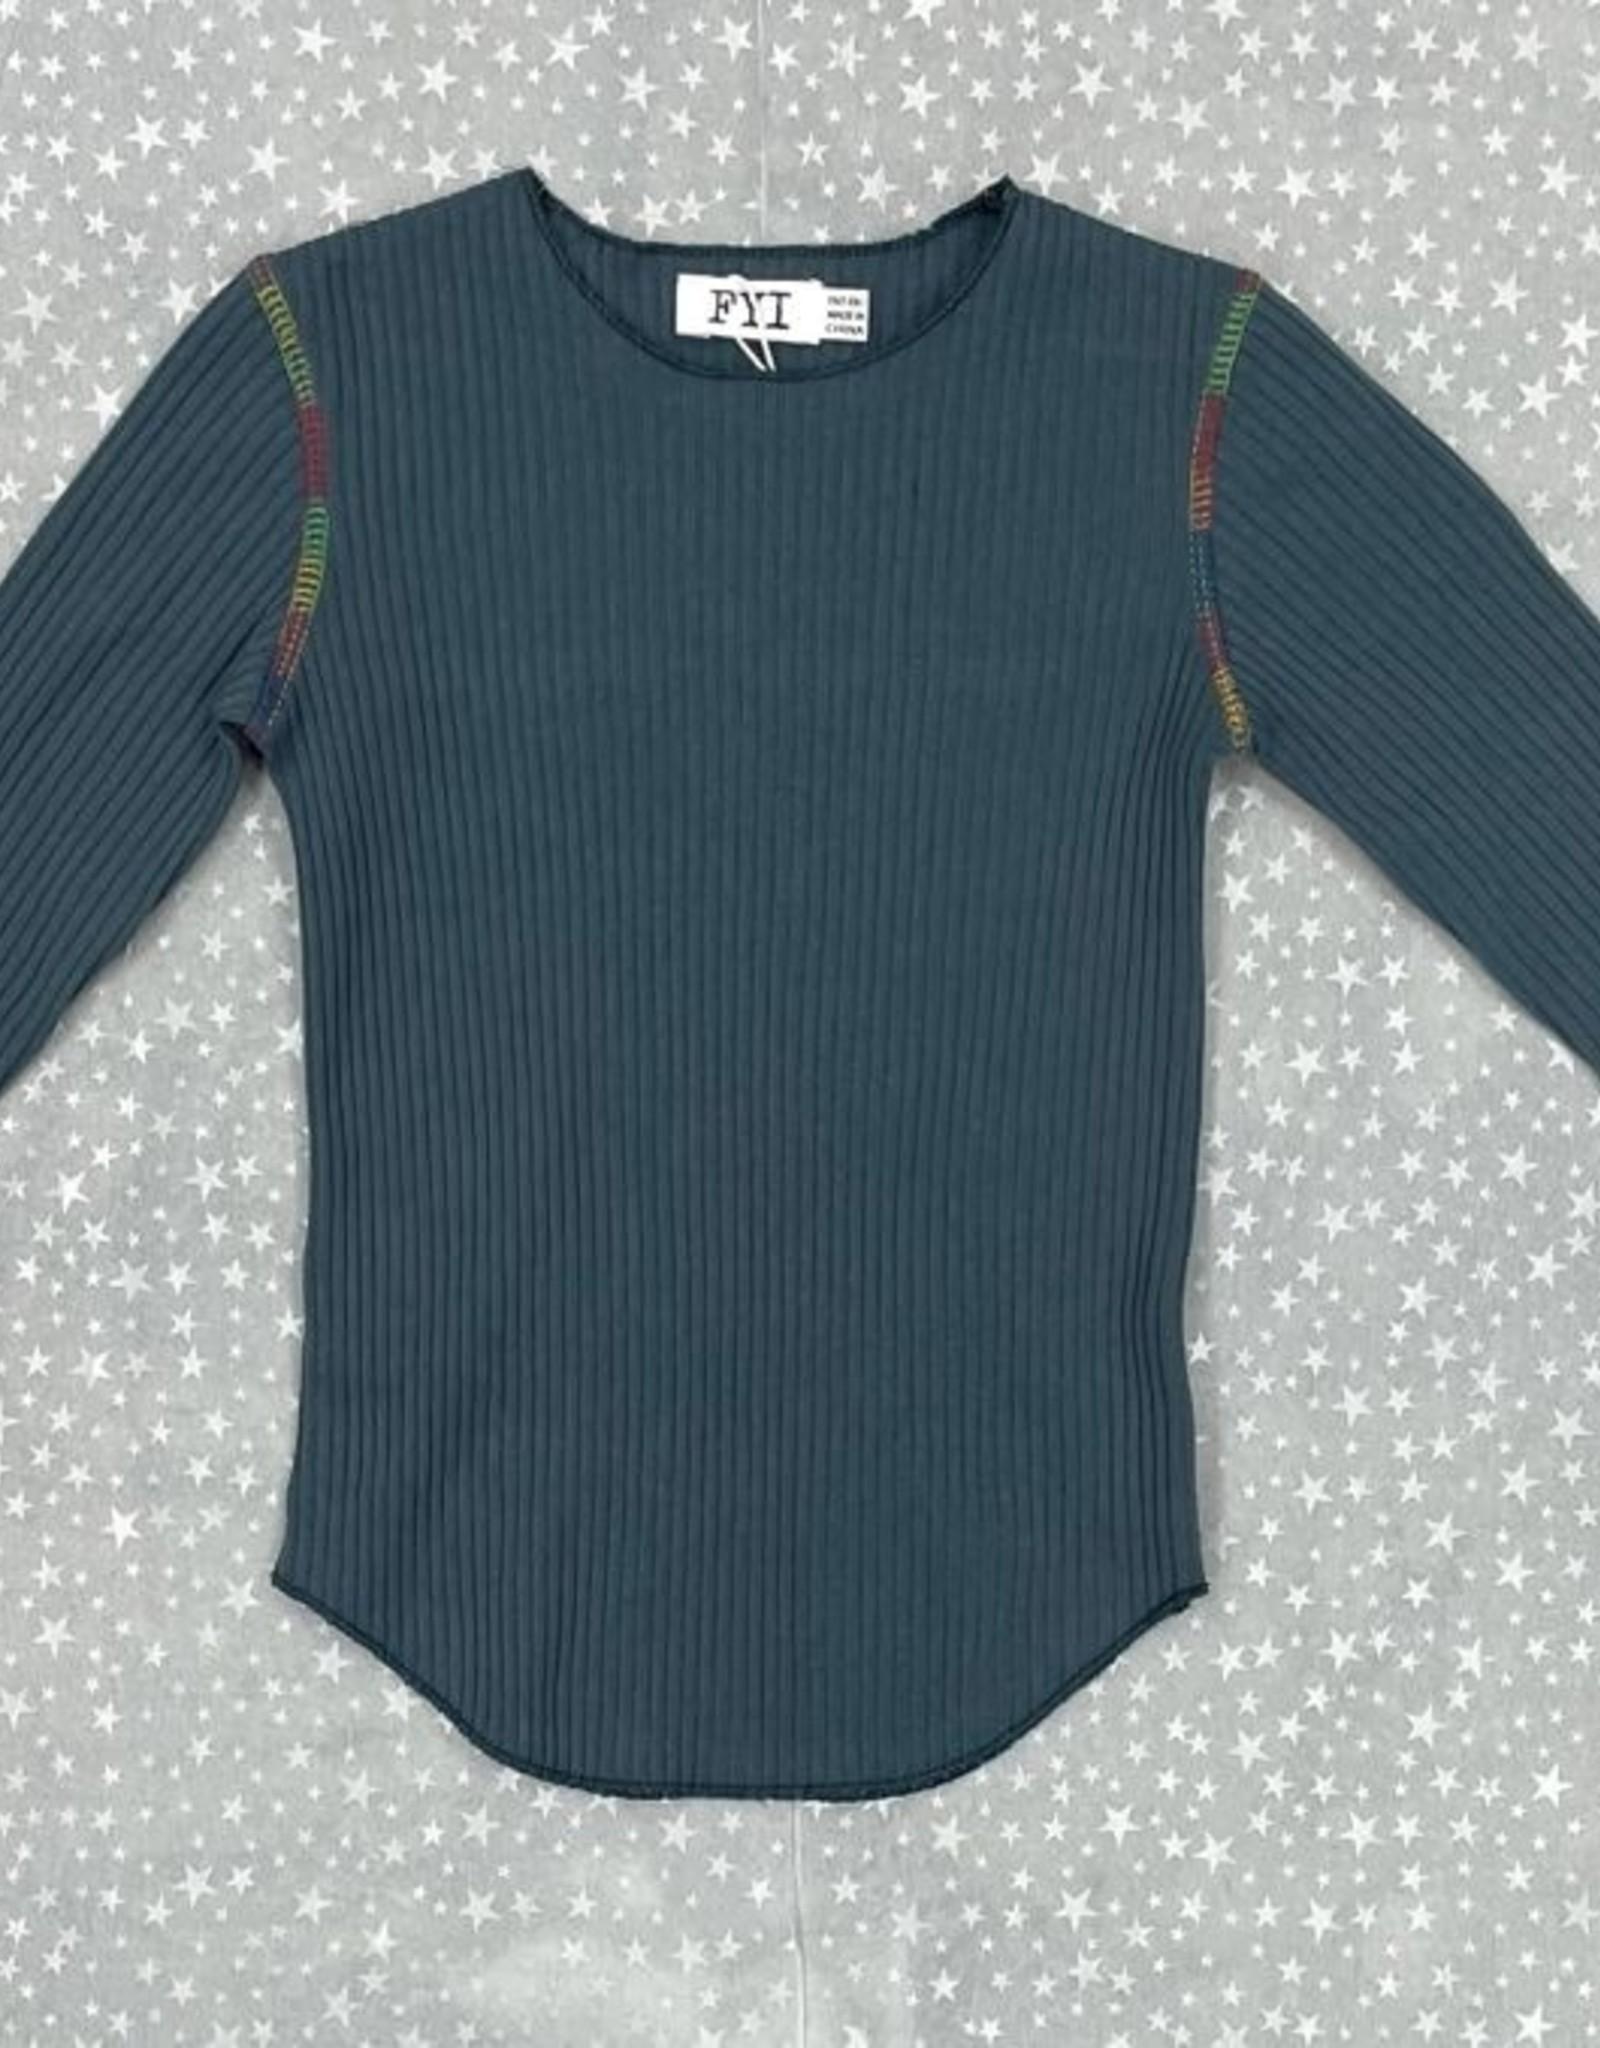 FYI FYI Ribbed Shirt with Rainbow Stitching